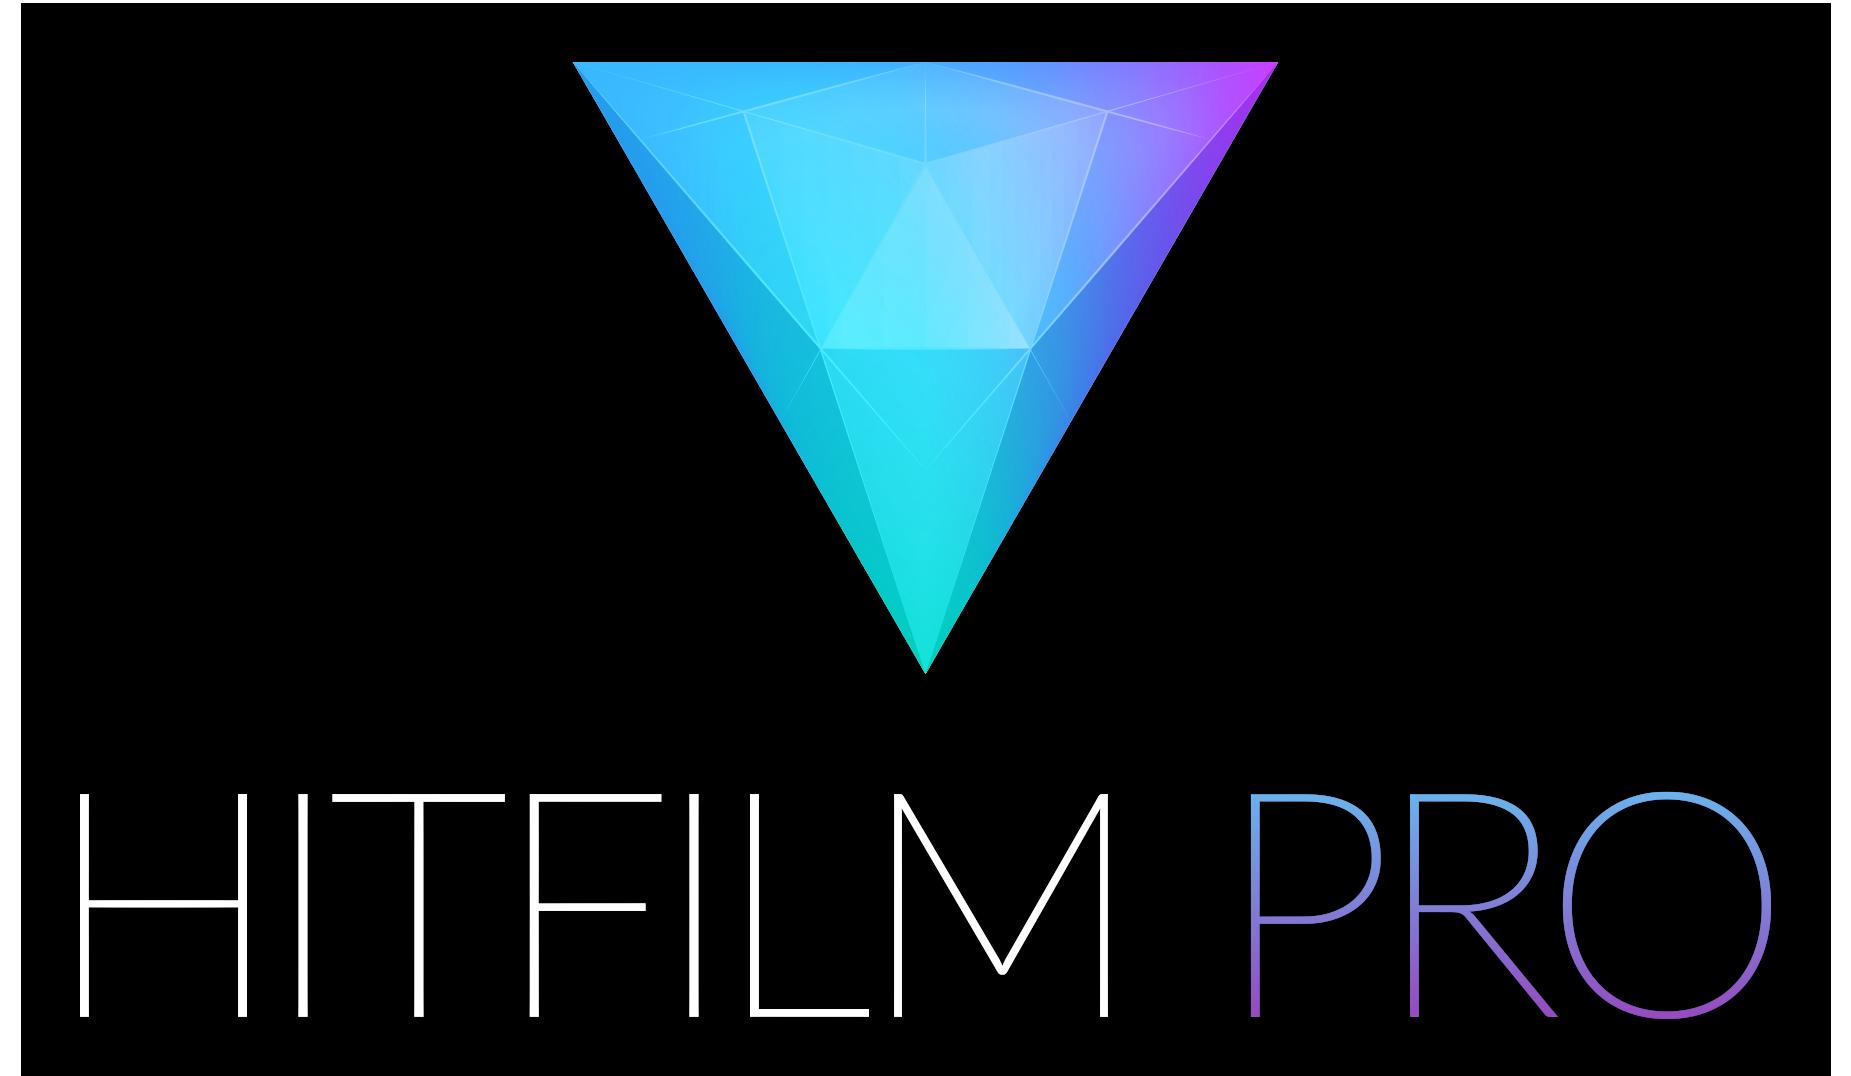 hitfilm pro 2017 video effects software for mac pc. Black Bedroom Furniture Sets. Home Design Ideas